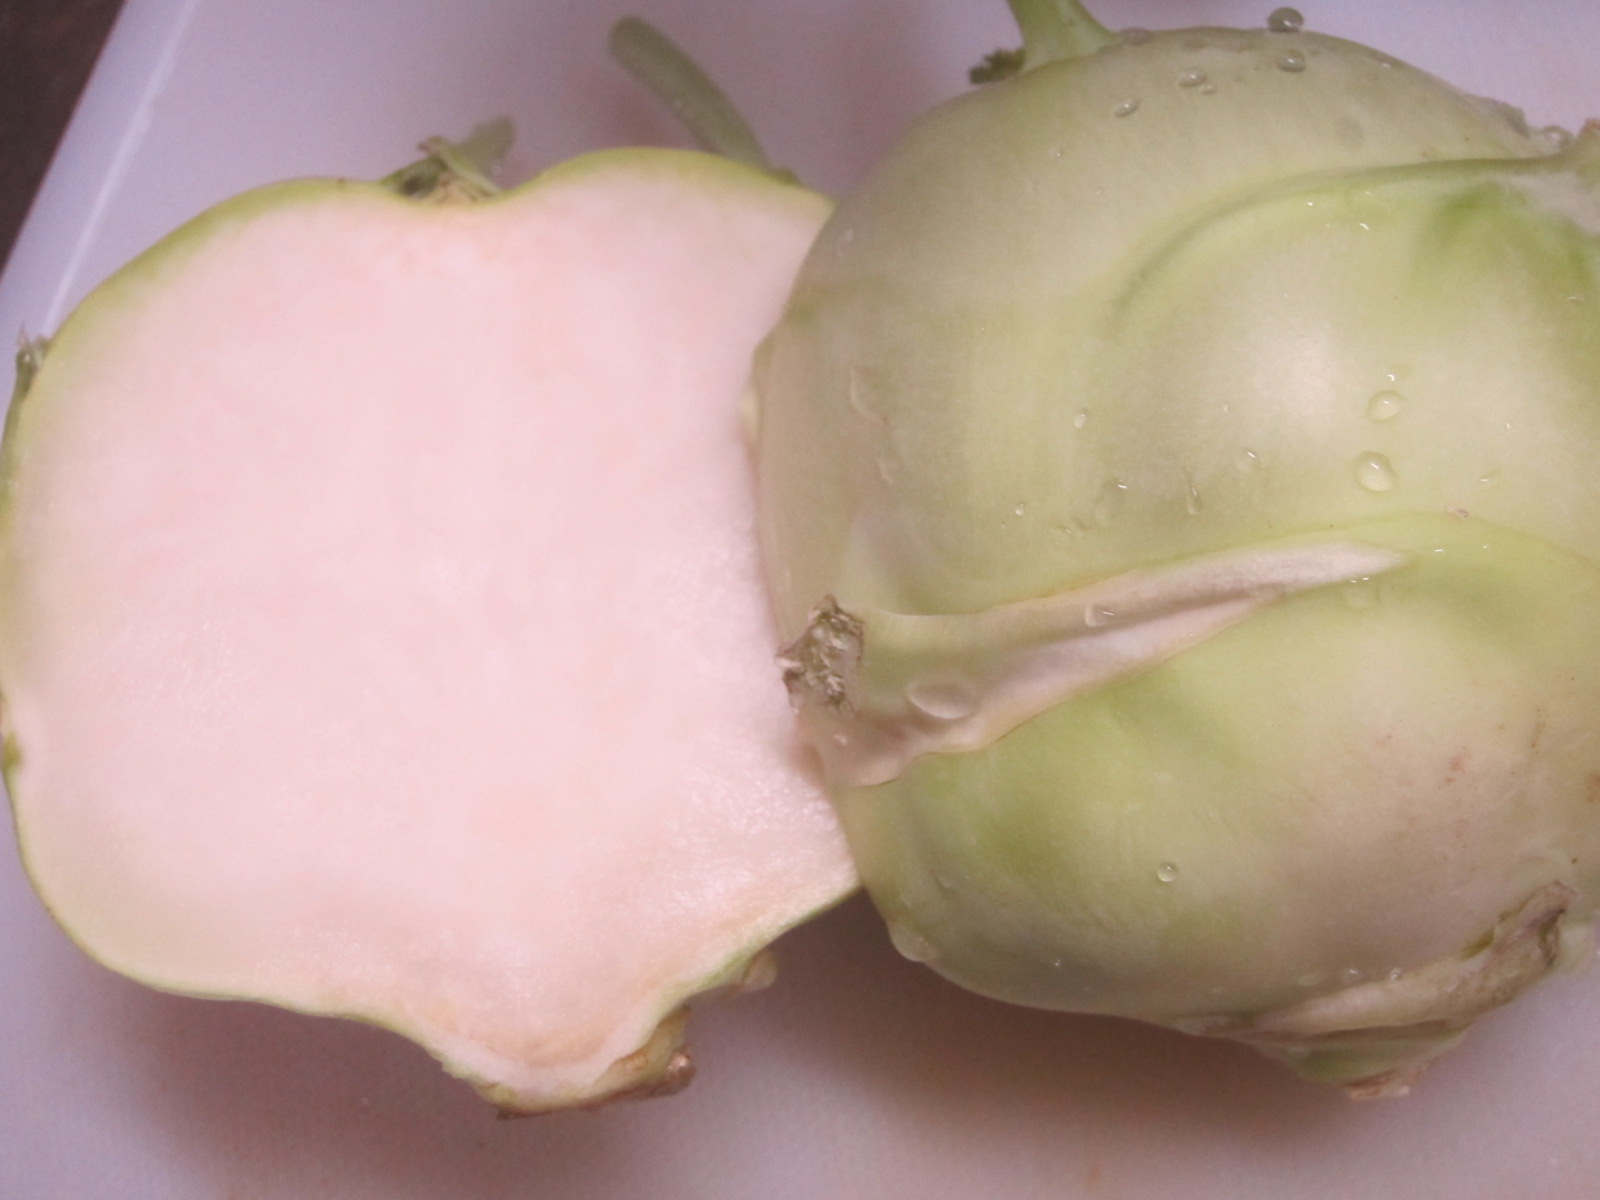 IMG 0016 - コールラビという野菜に初挑戦してみました